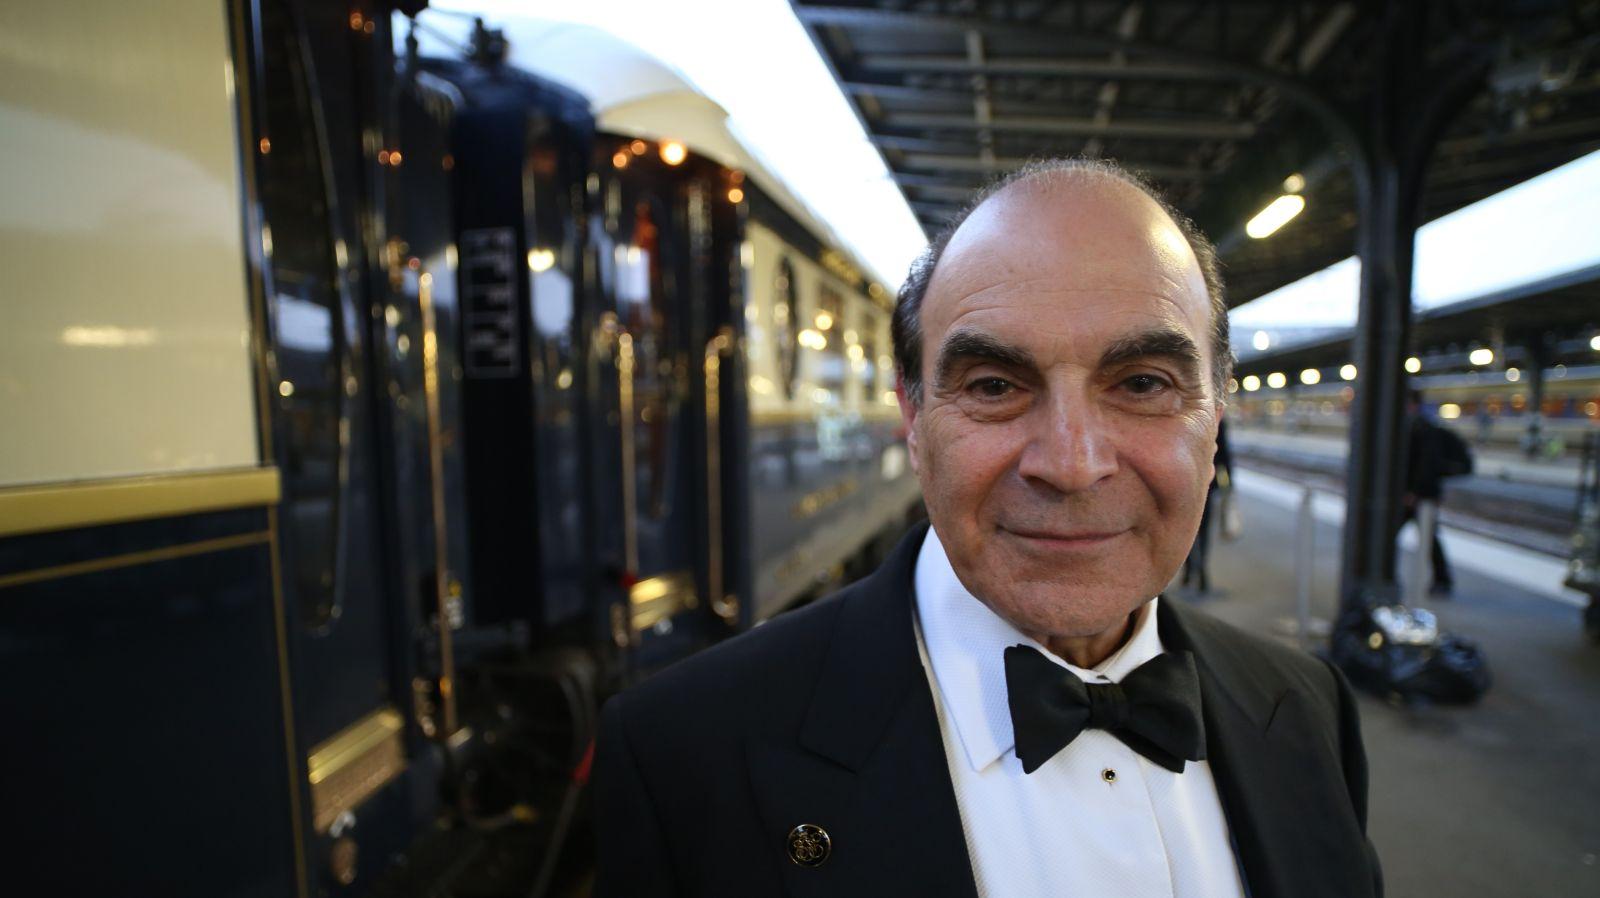 David Suchet & the Venice Simplon Orient Express ok